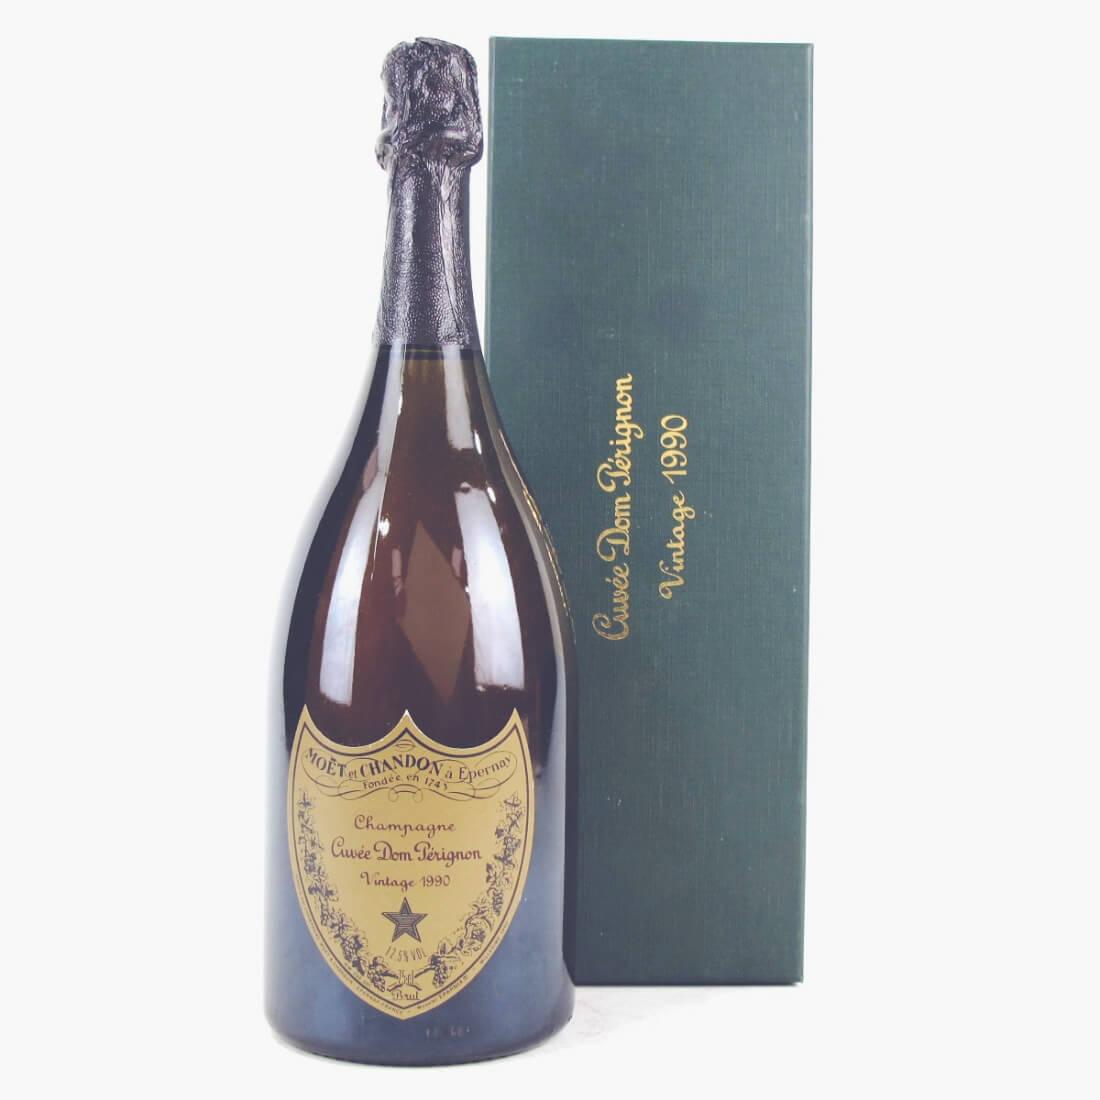 Matt Desert Island Wines - 1990 Dom Perignon